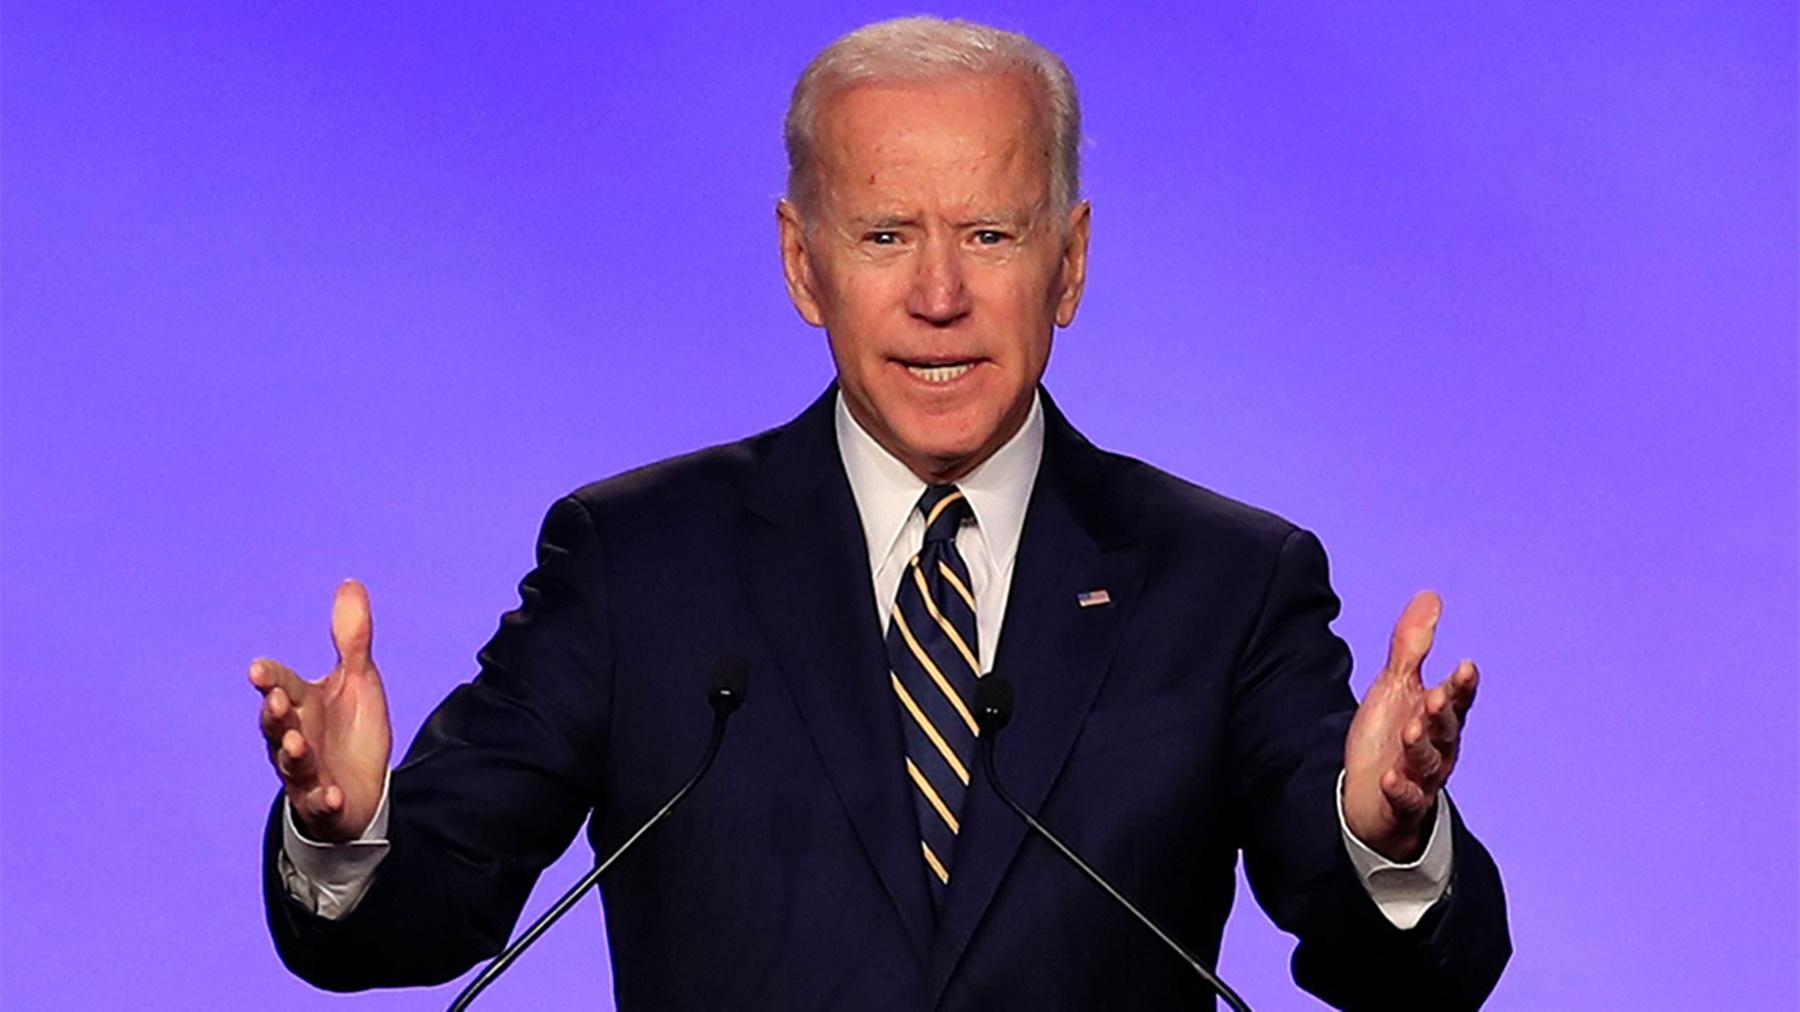 Joe Biden Barack Obama Donald Trump 2020 Election